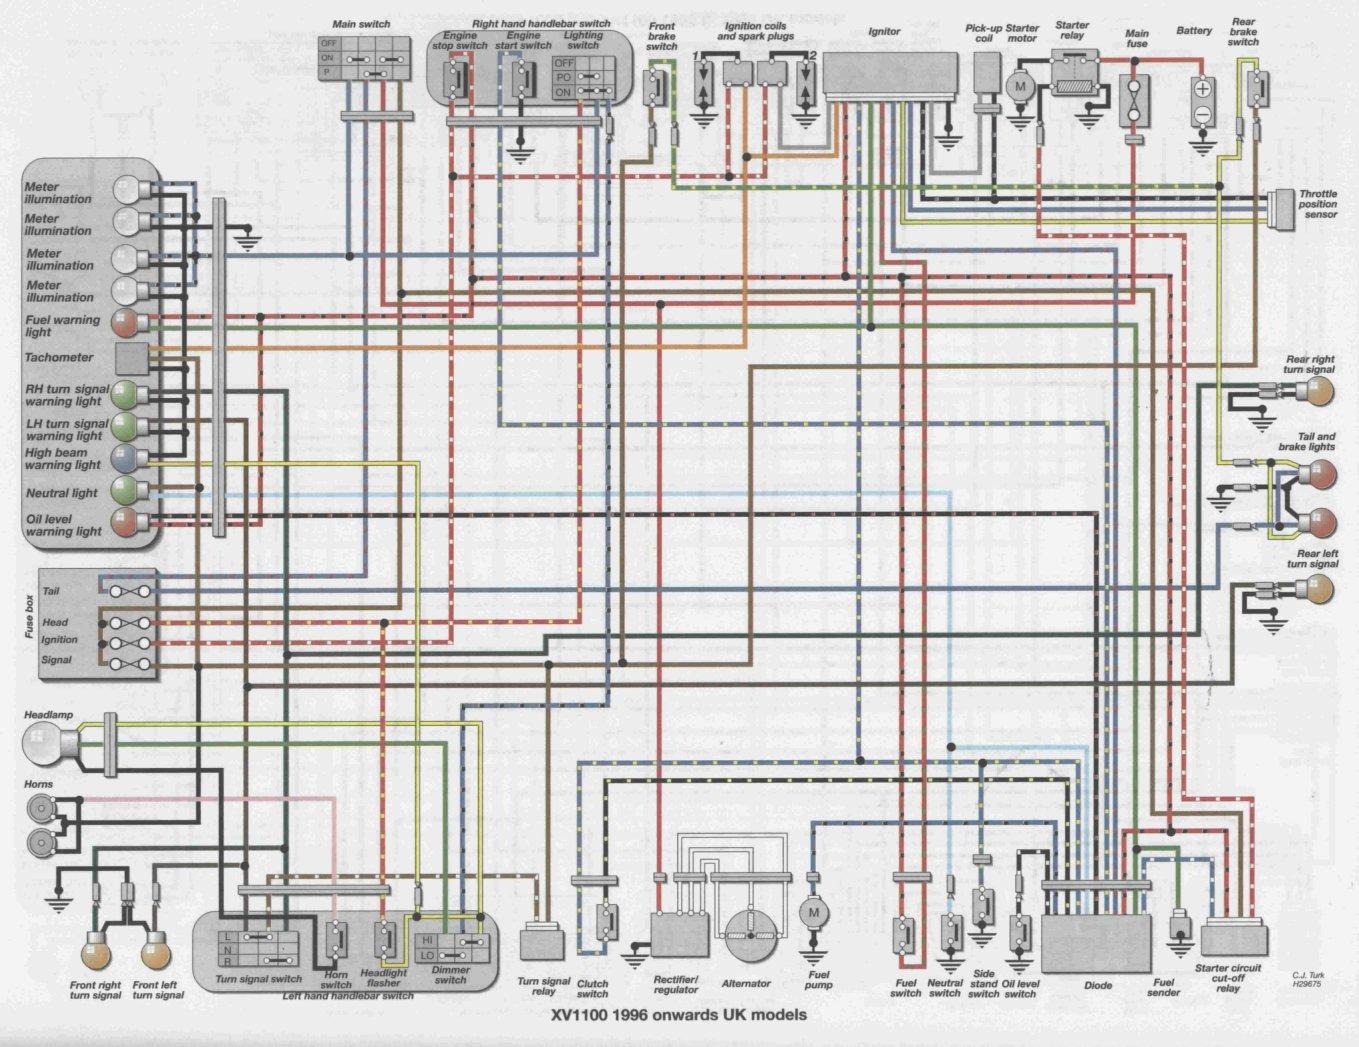 virago xv700 wiring diagram flasher relay wiring diagramvirago xv700 wiring diagram flasher relay new model wiring diagramhome · virago xv700 wiring diagram flasher